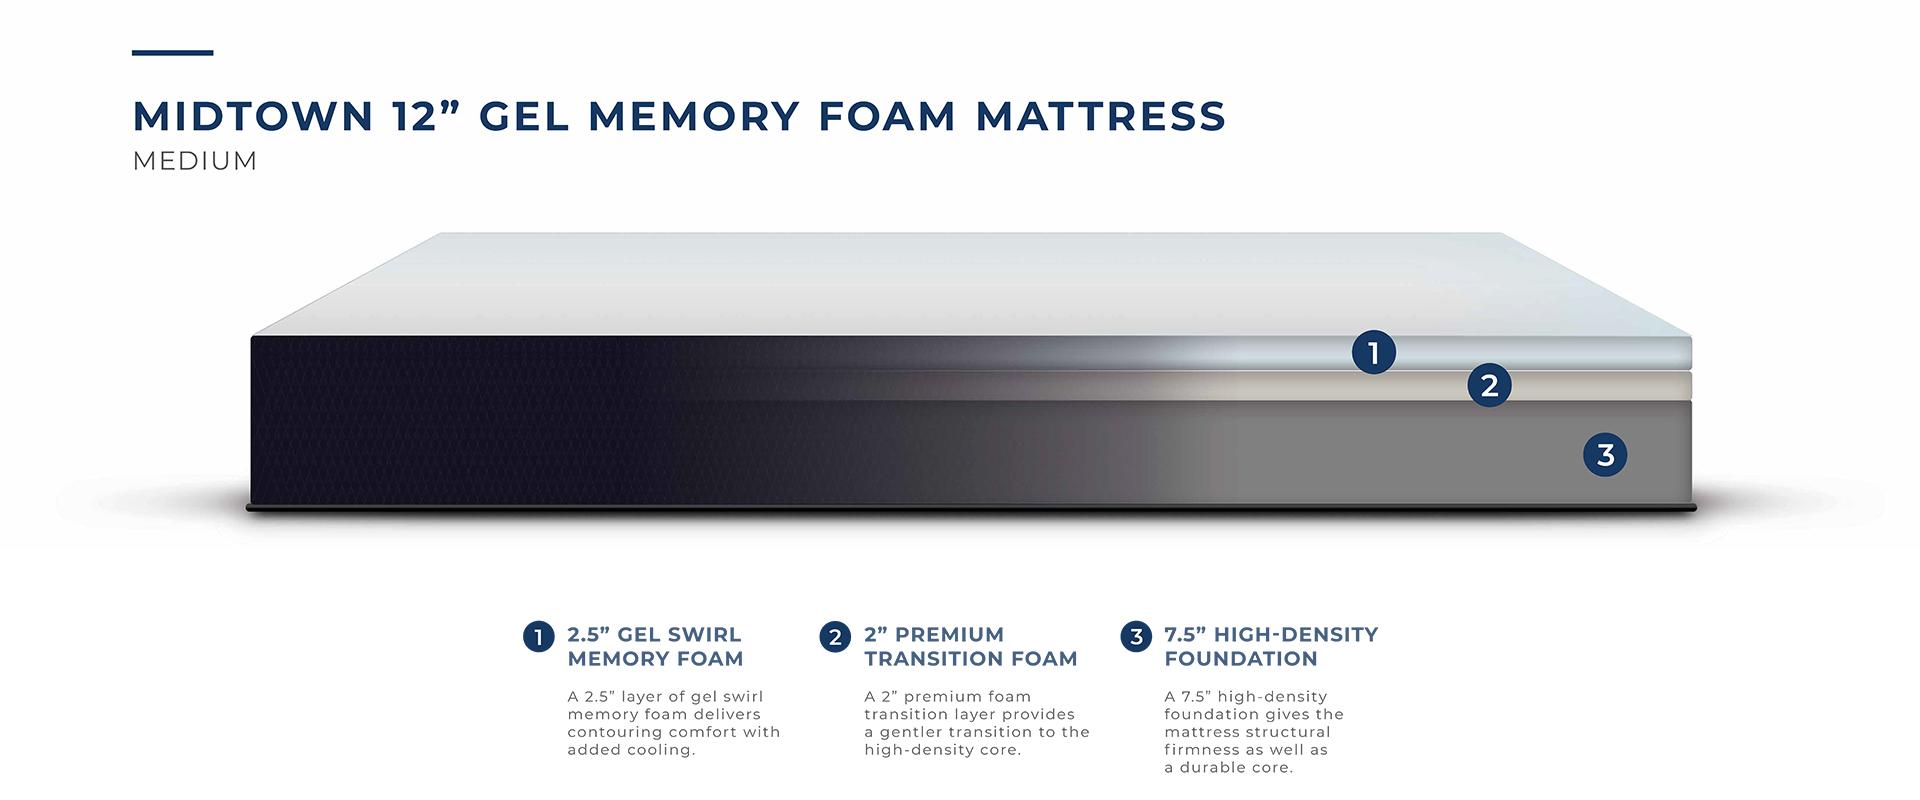 Taylor 12″ Gel Memory Foam Mattress – Mattress King Inc. is Carson